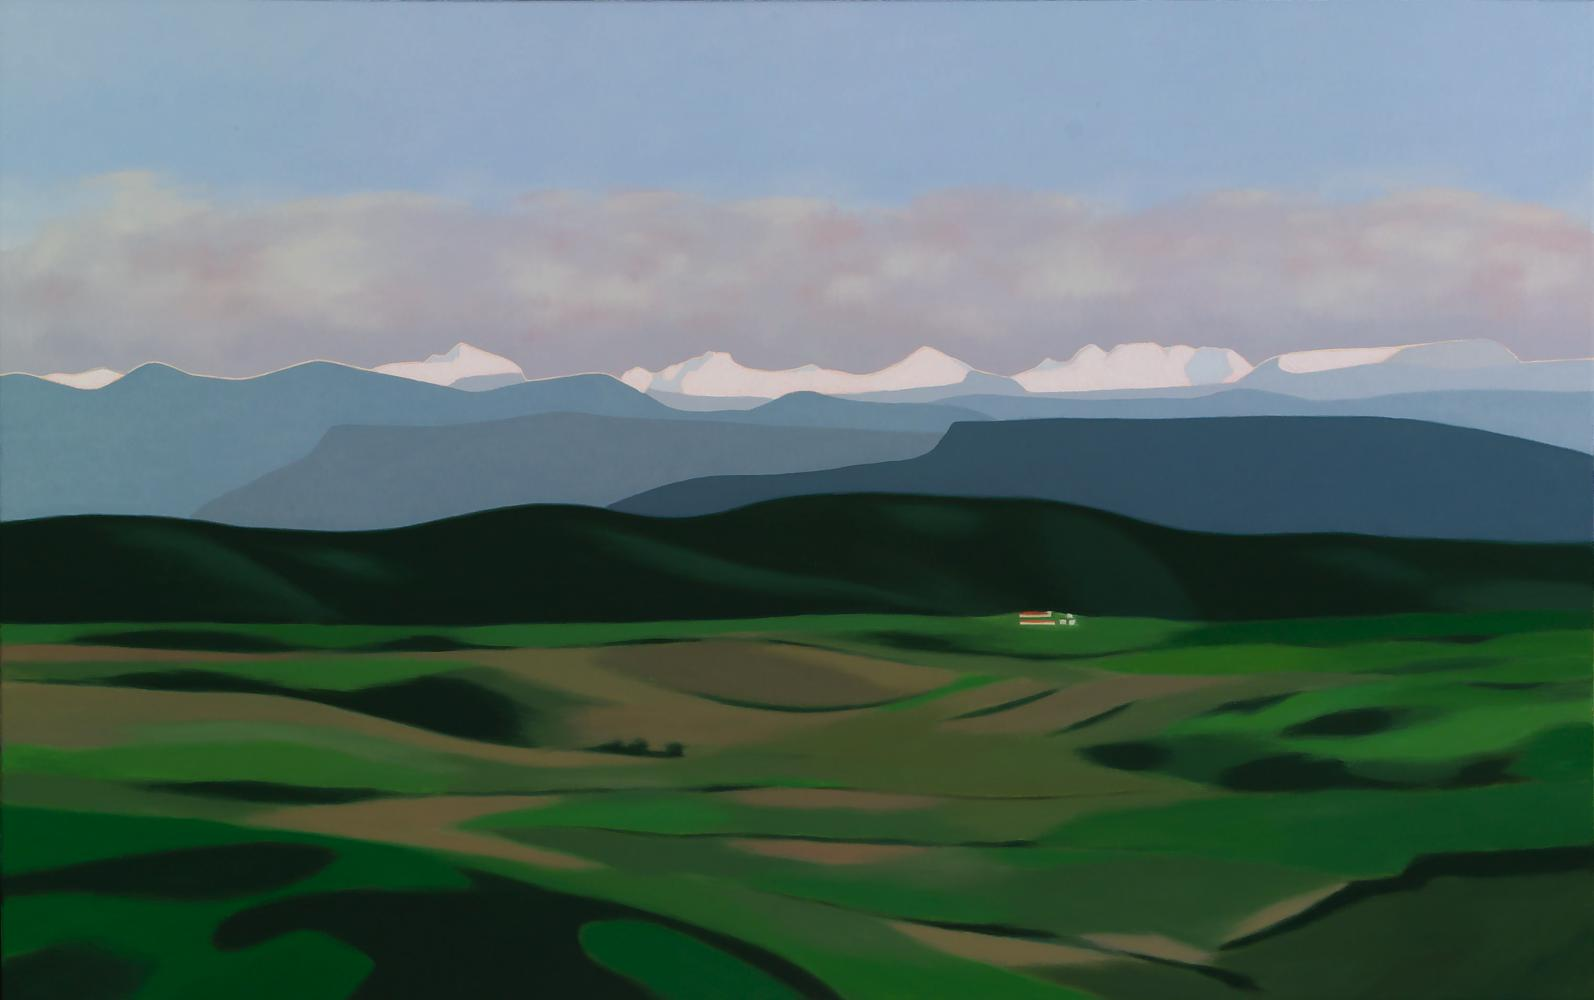 Desde Irulegui (Pirineo navarro), 73 x 116 cm, óleo lienzo, 2013.